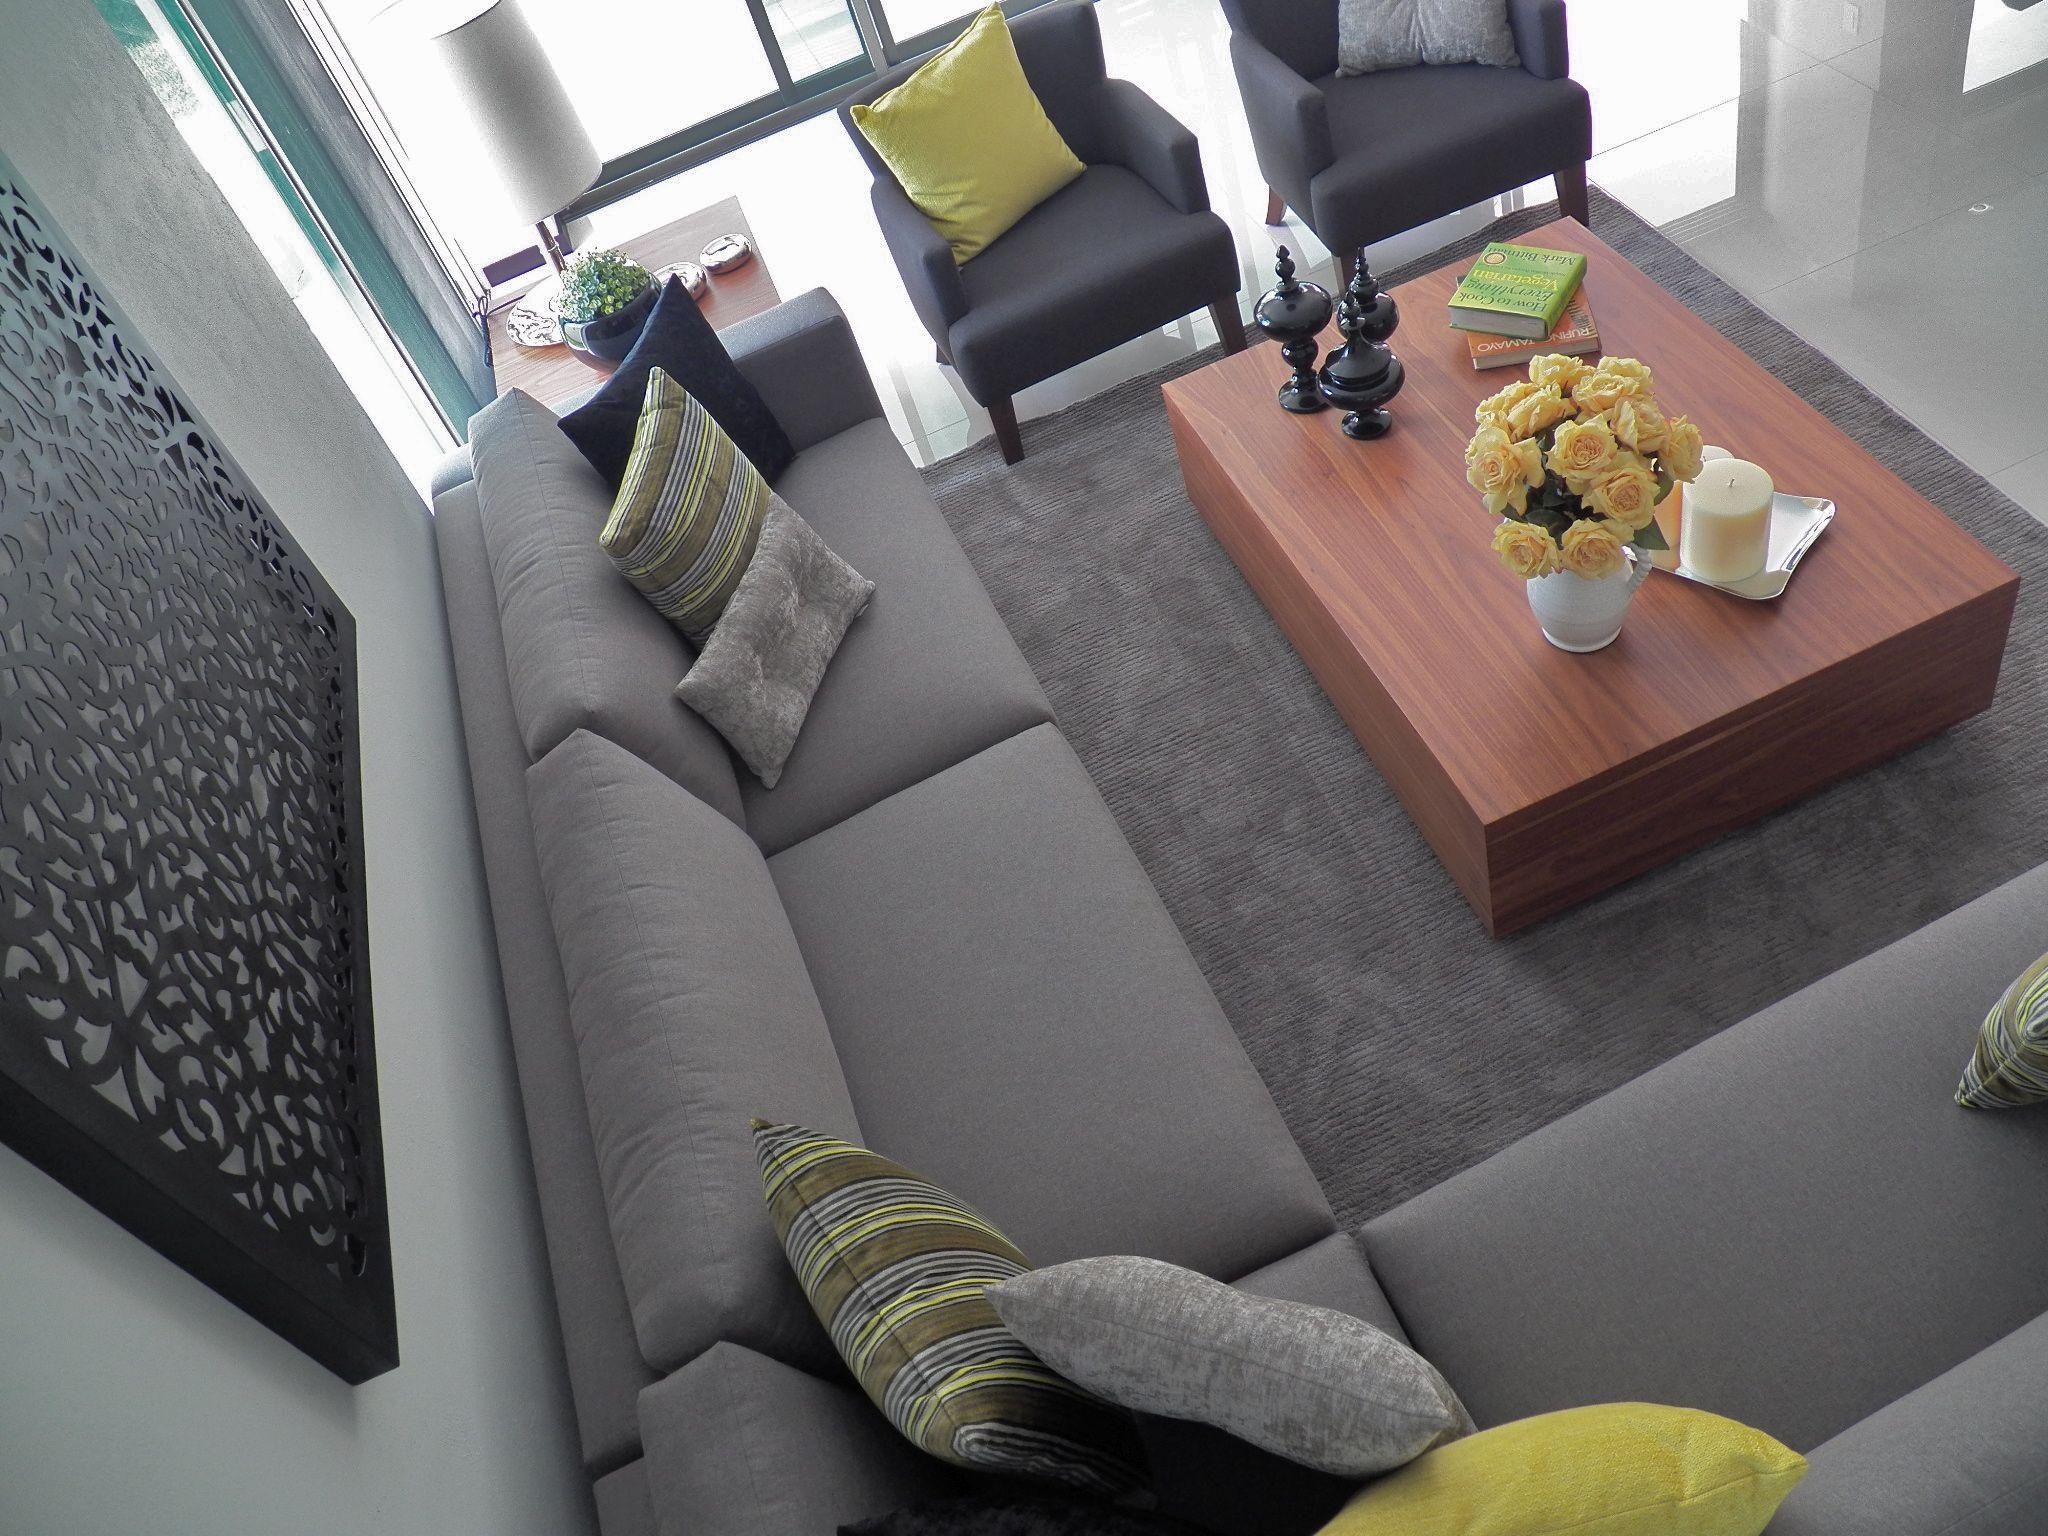 sala gris amarillo salon living room sala gris salas pequeñas sala